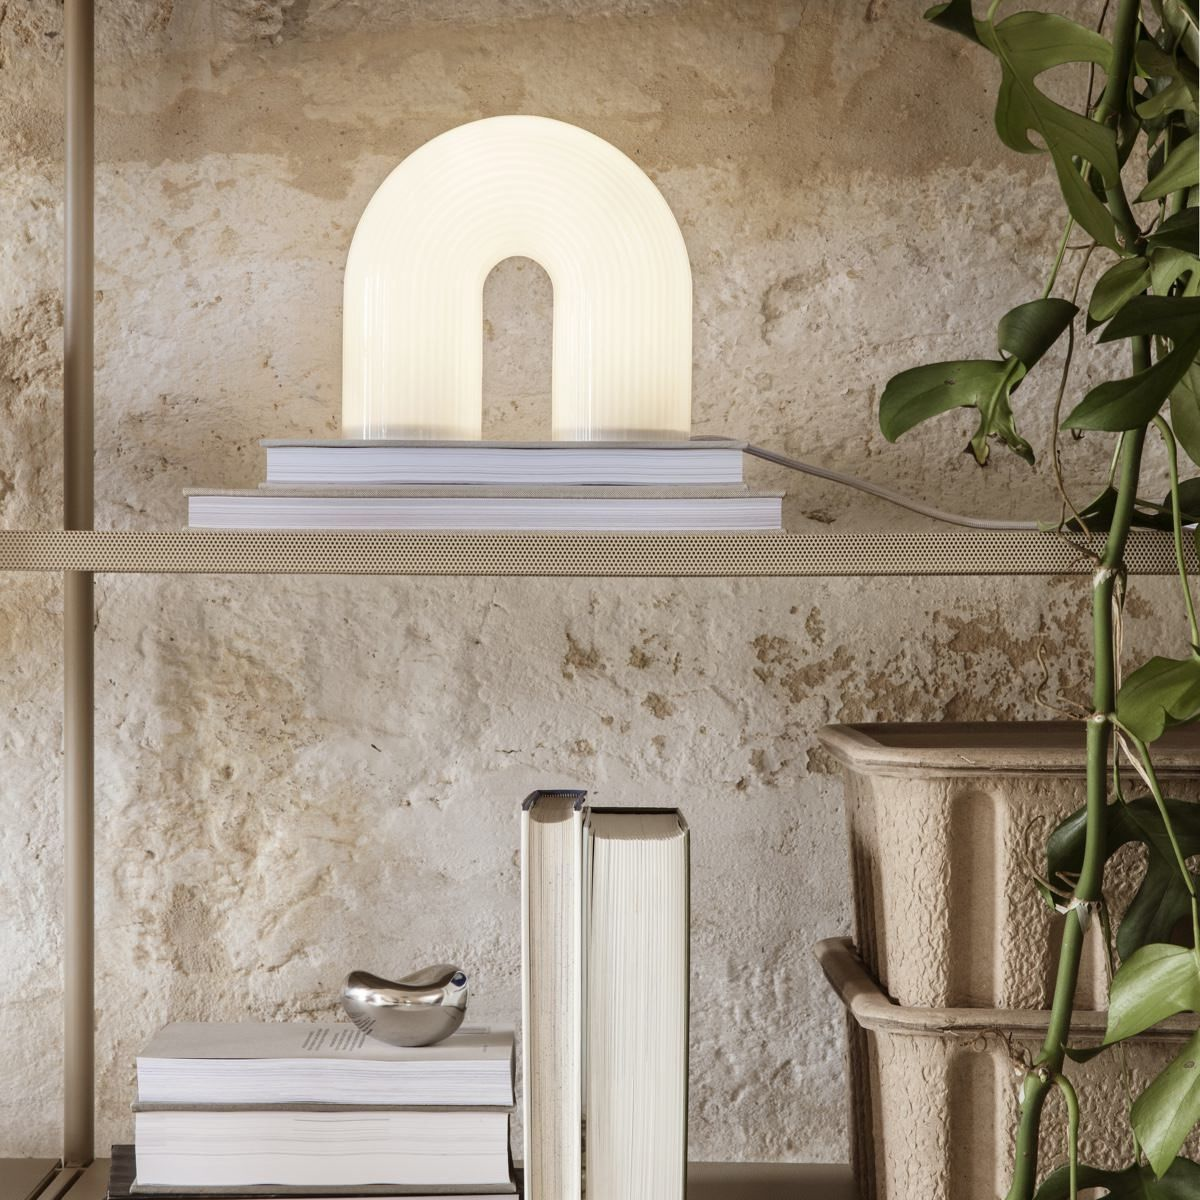 Ferm Living Vuelta Table Lamp on standing on book a shelf